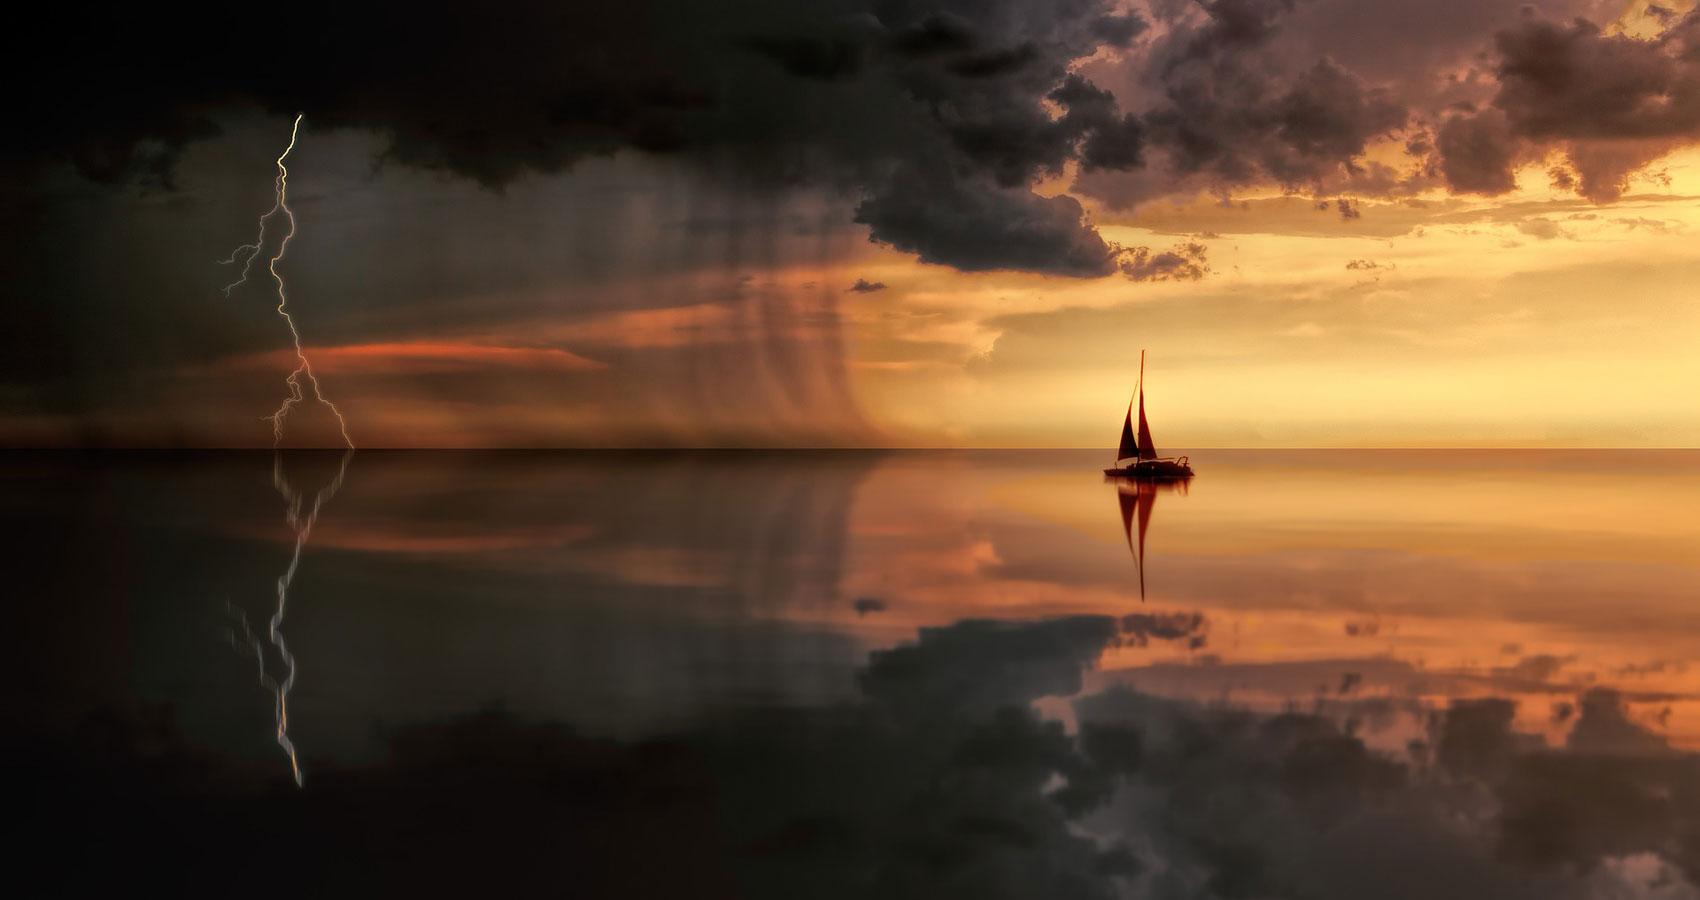 Port zagubionej nadziei by Joanna Kalinowska at Spillwords.com